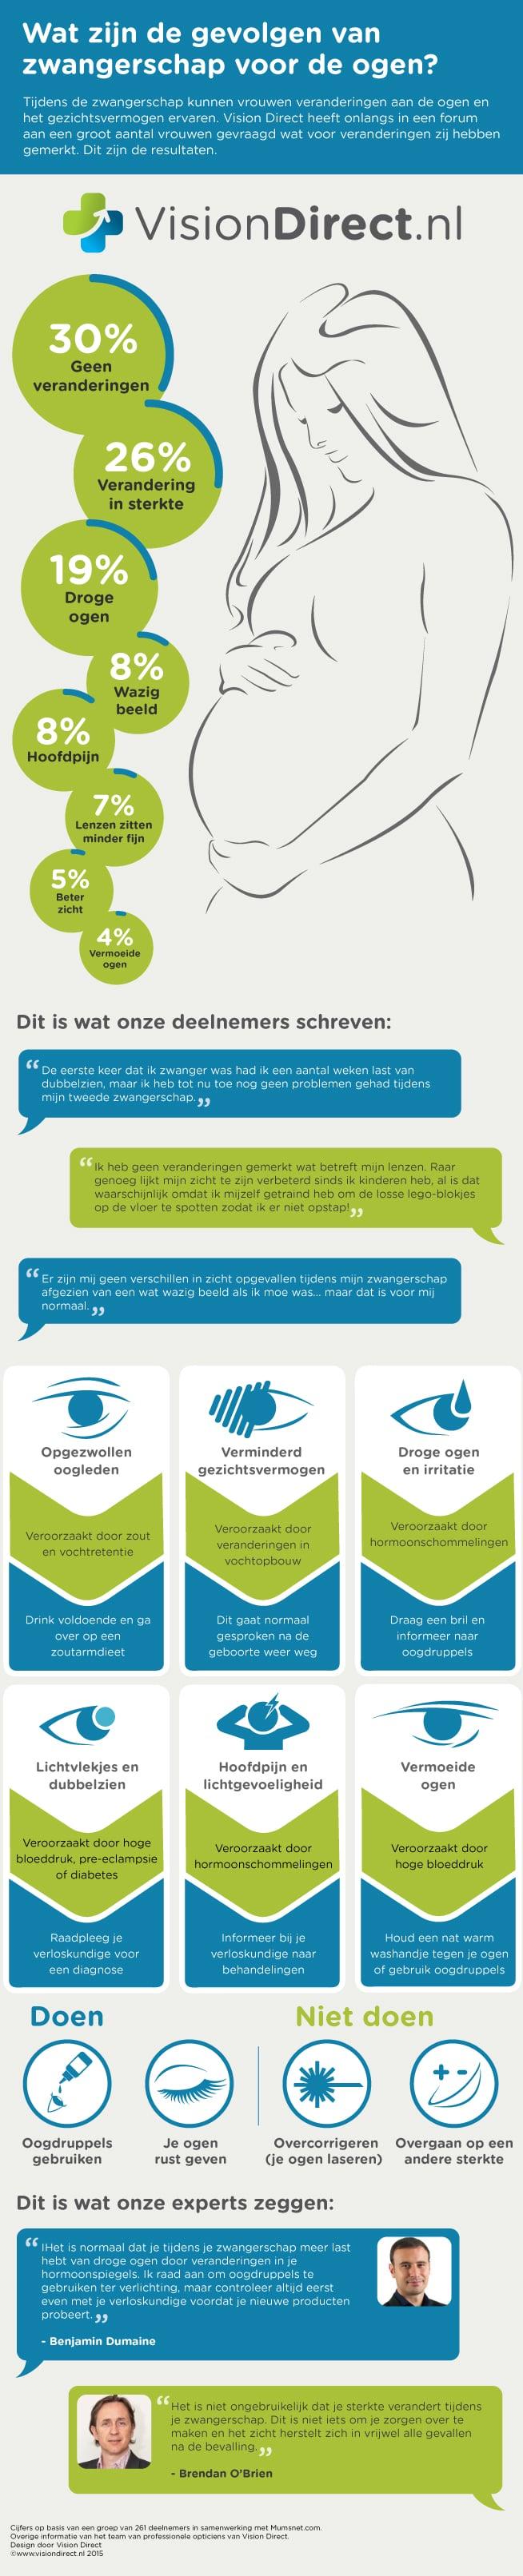 Zwangerschap en ogen infographic